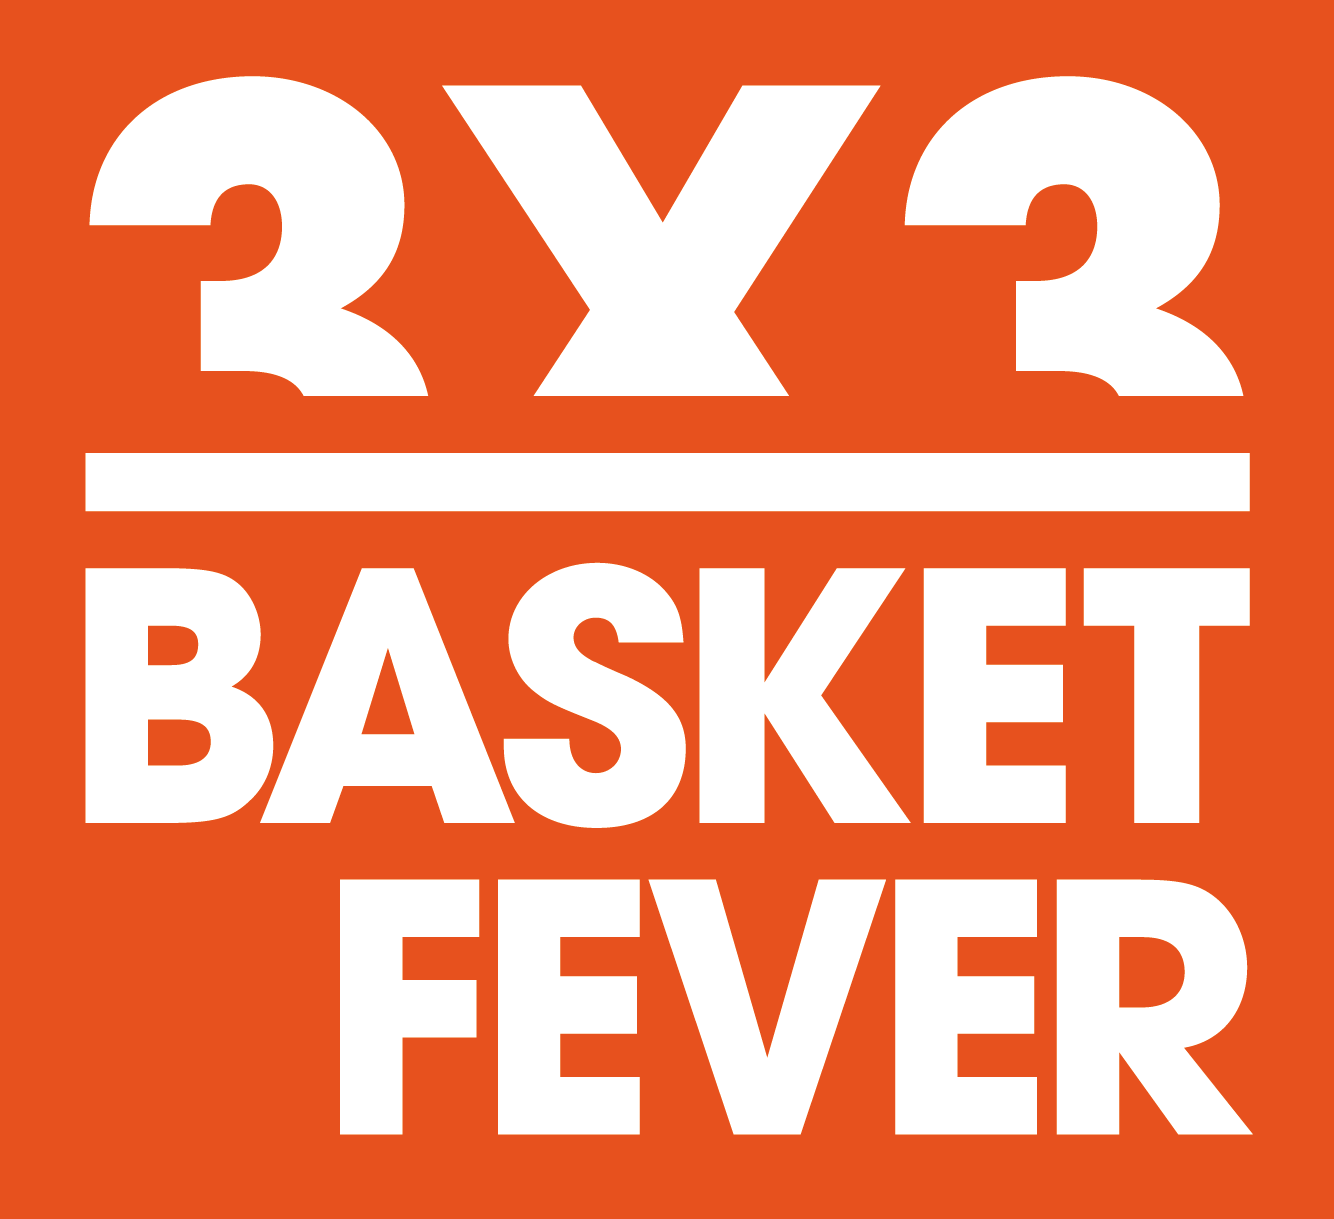 Basketfever